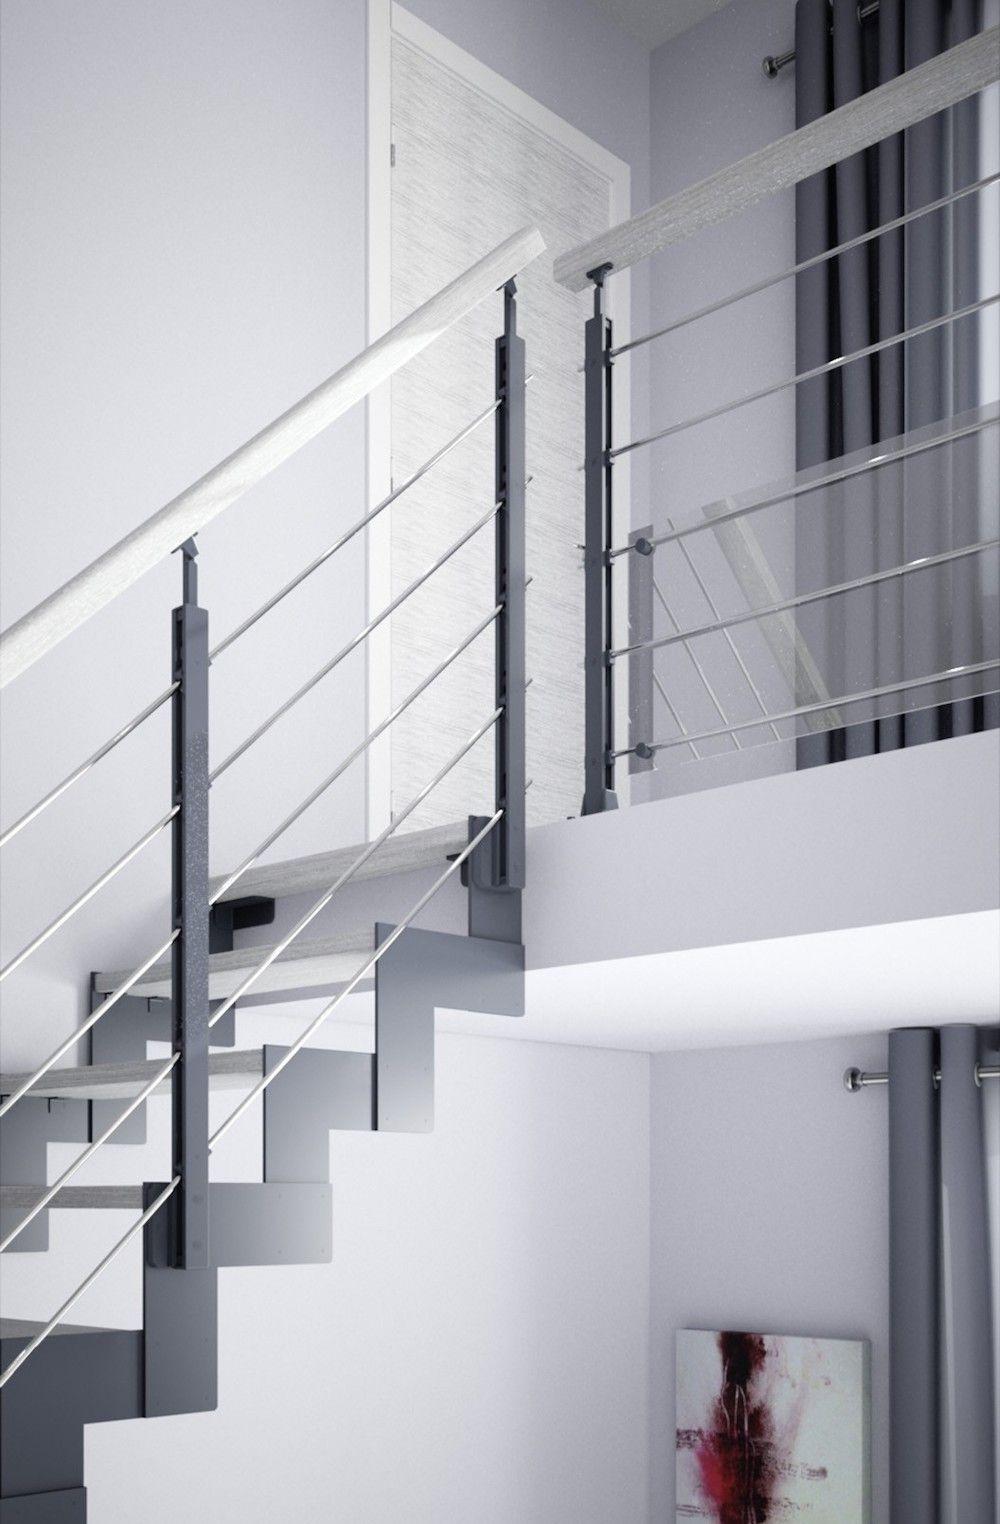 Balustrade En Acier Epure Steel Balustrade Interior Railings House Architecture Design